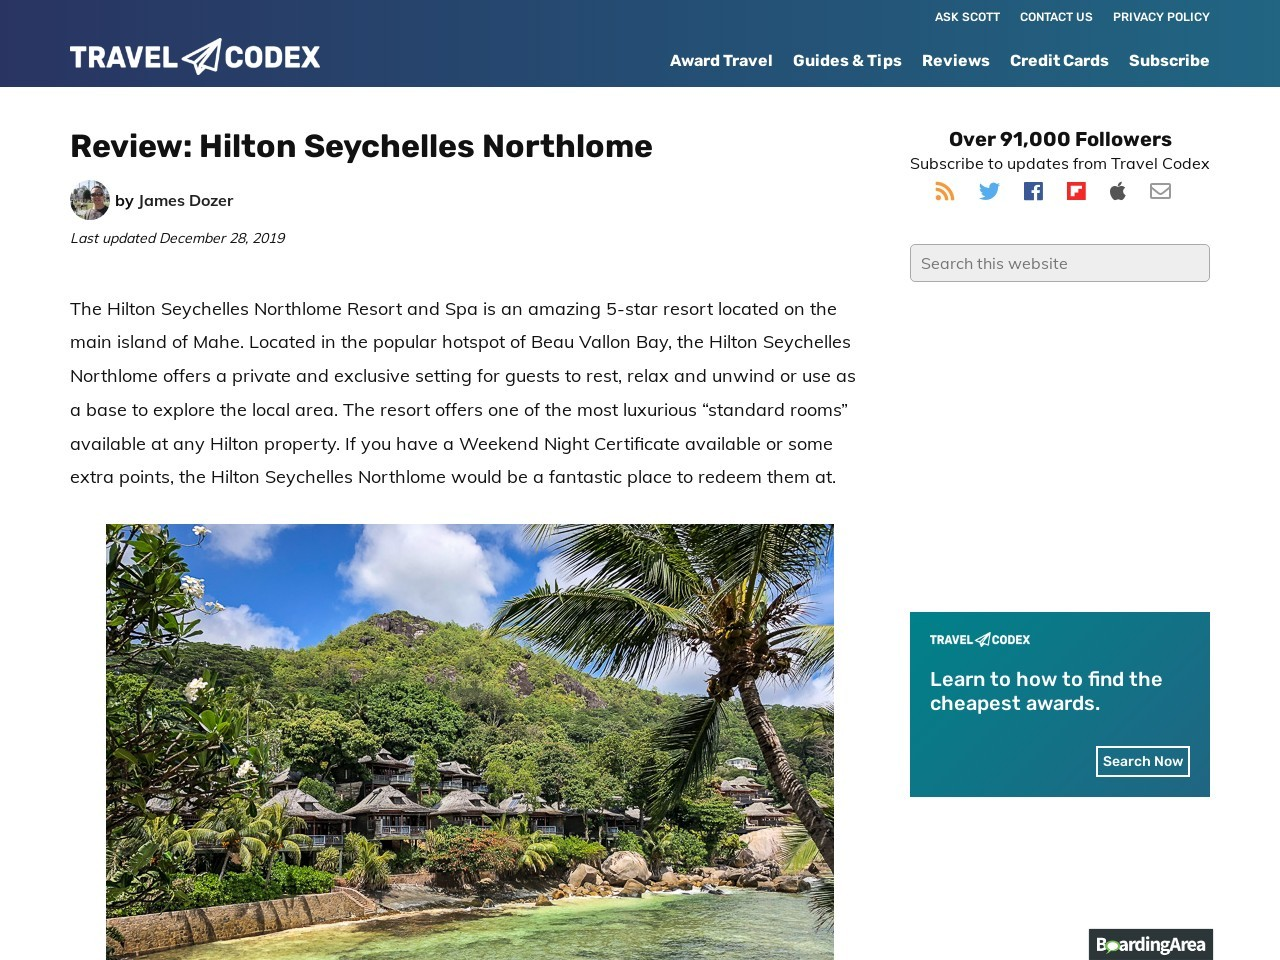 Hilton Seychelles Northlome